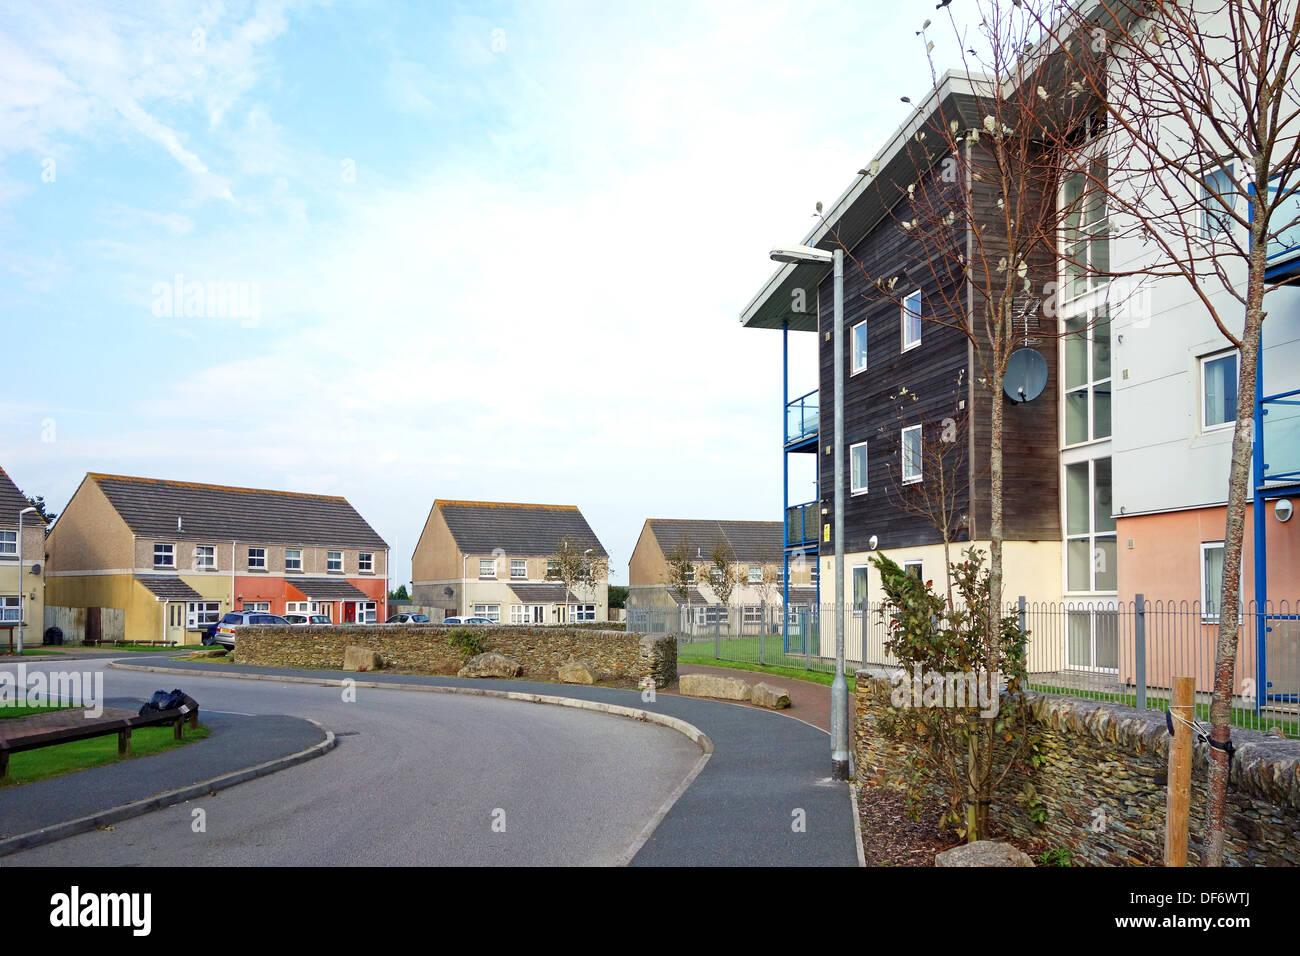 Social housing in Camborne, Cornwall, UK - Stock Image